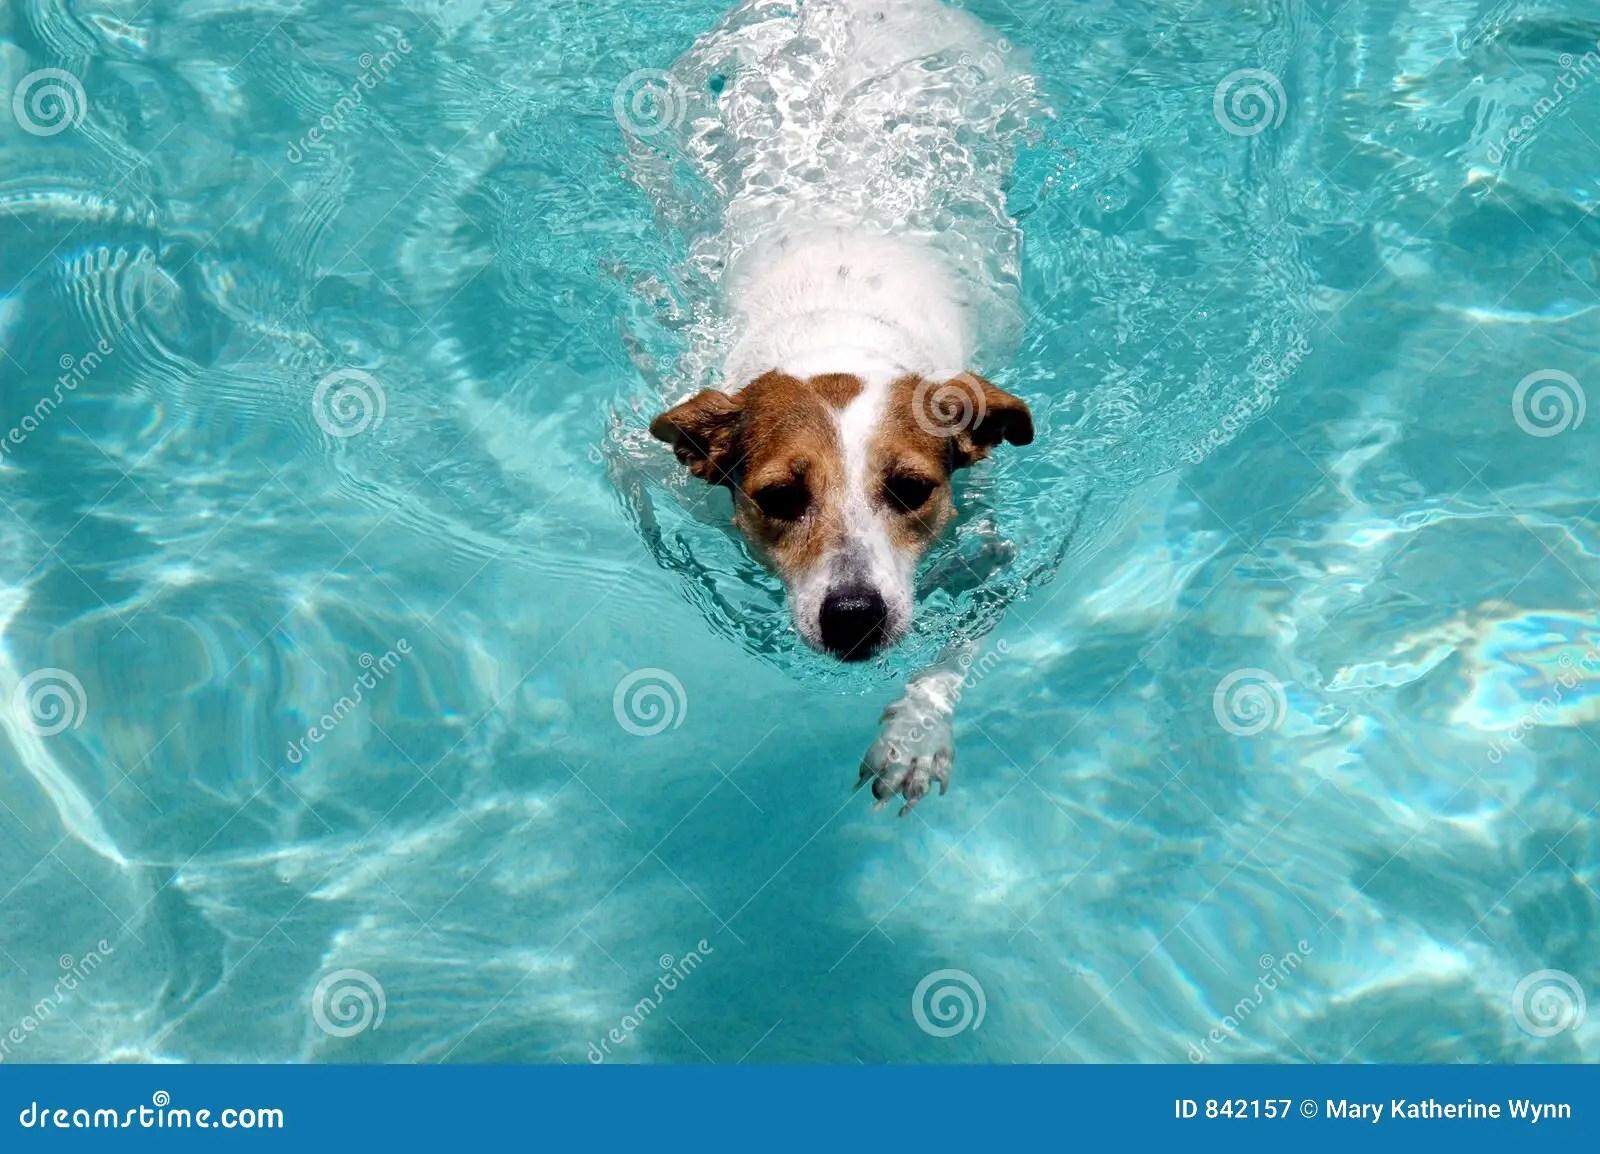 Swimming Dog Royalty Free Stock Photography  Image 842157